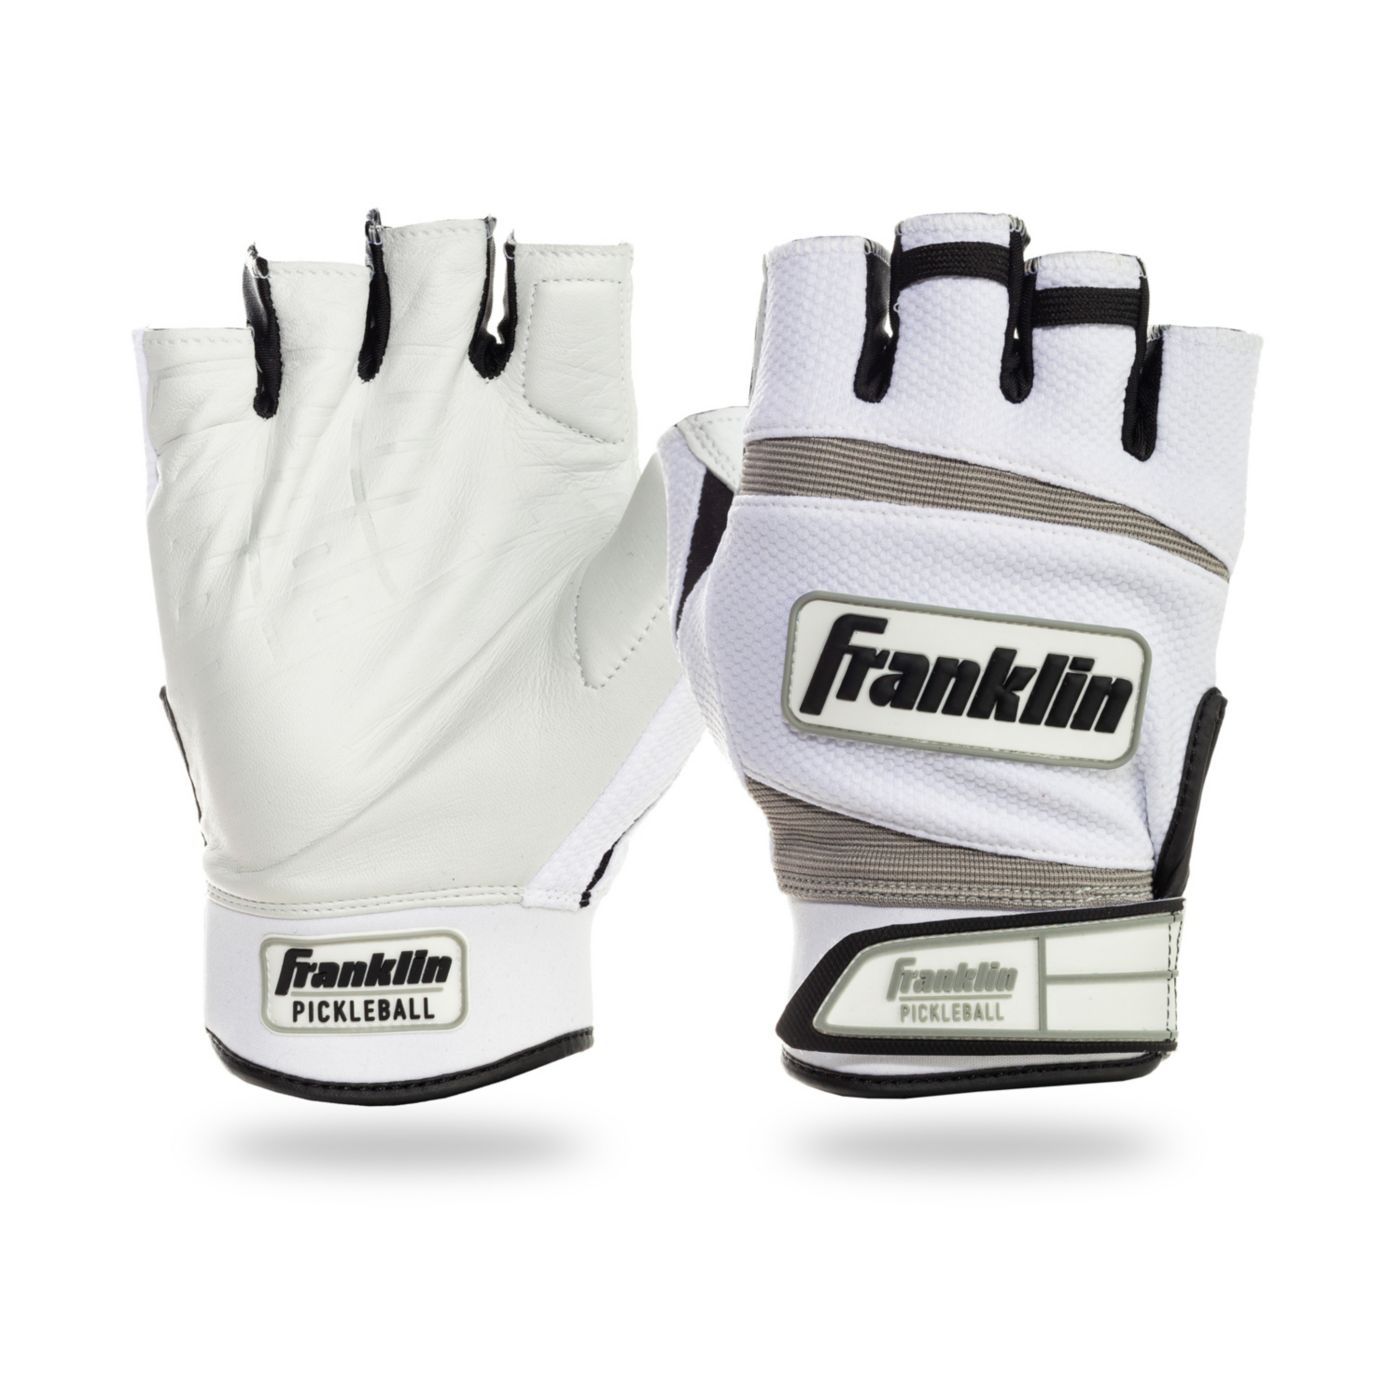 Franklin Single Pickleball Glove